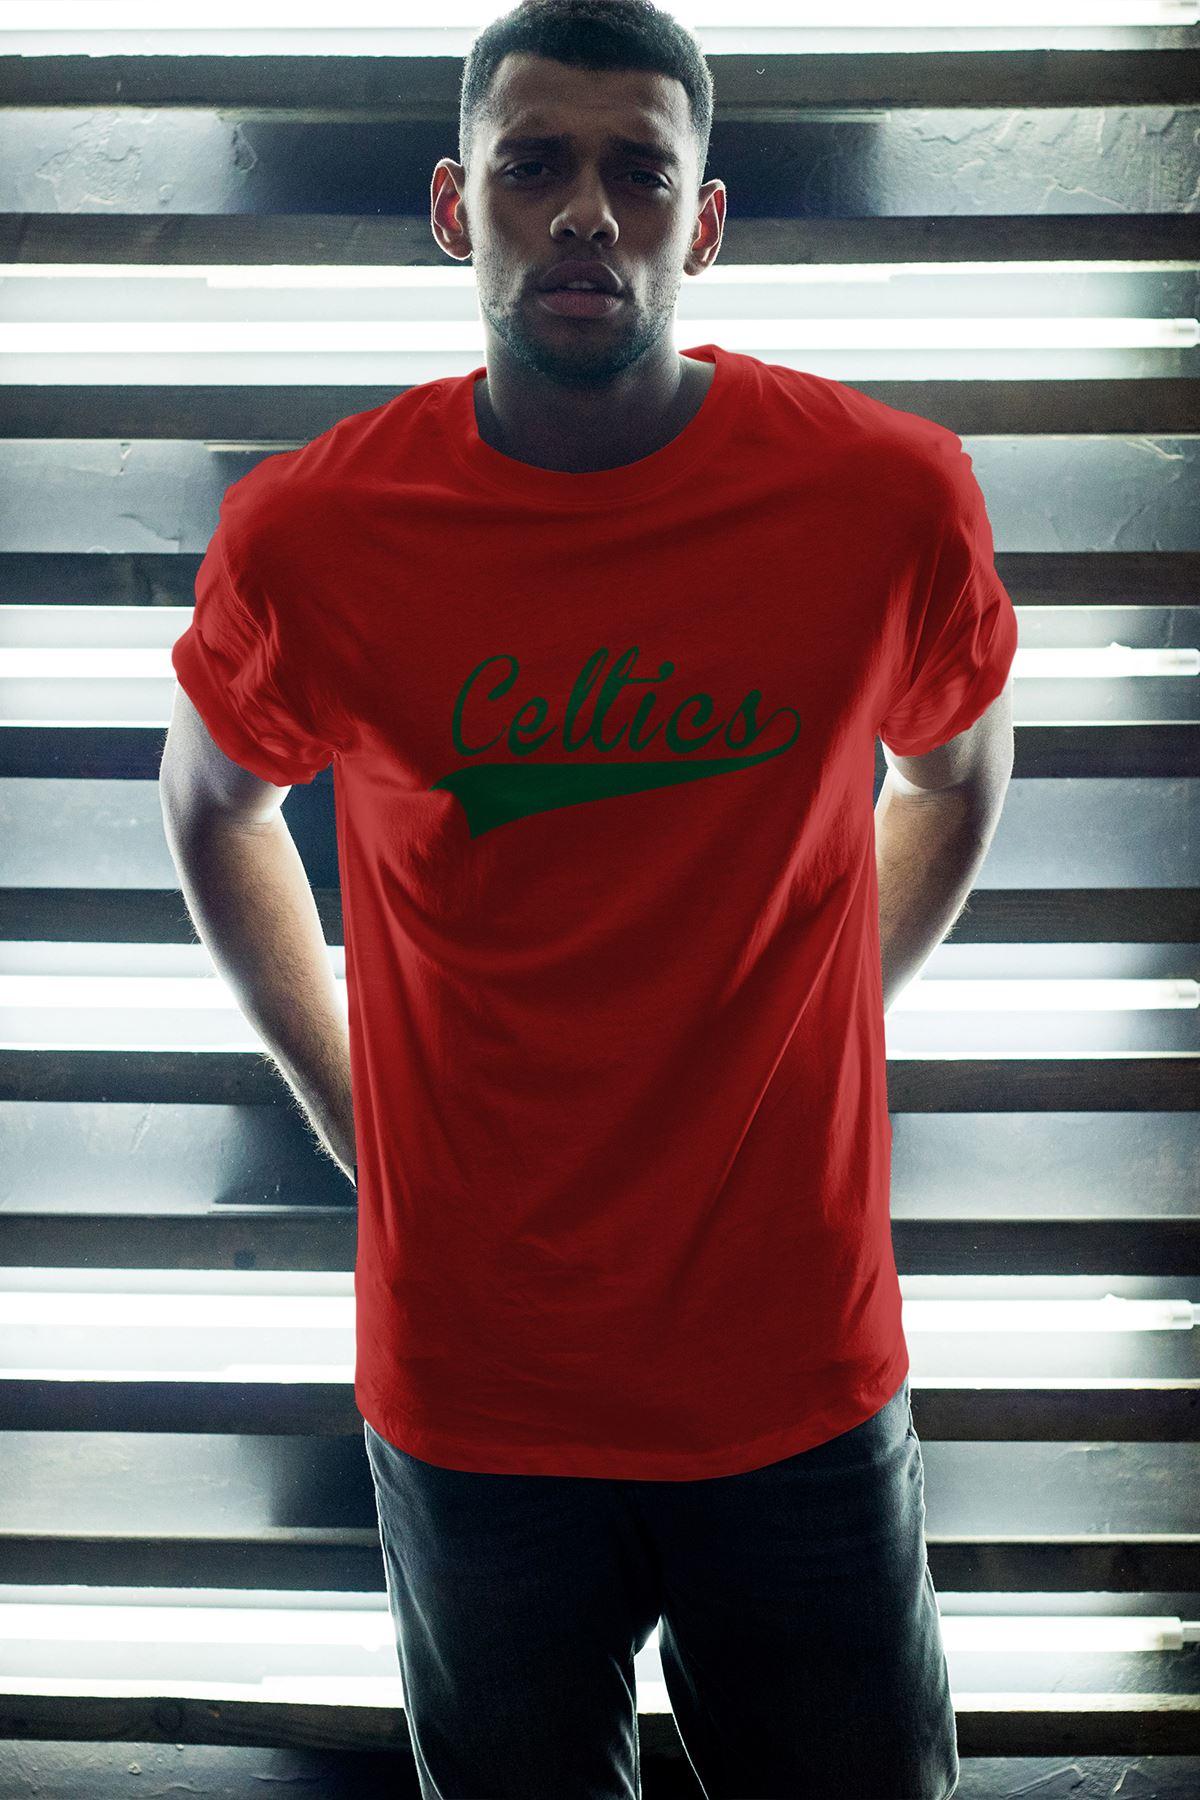 Boston Celtics 32 Kırmızı Erkek Oversize Tshirt - Tişört